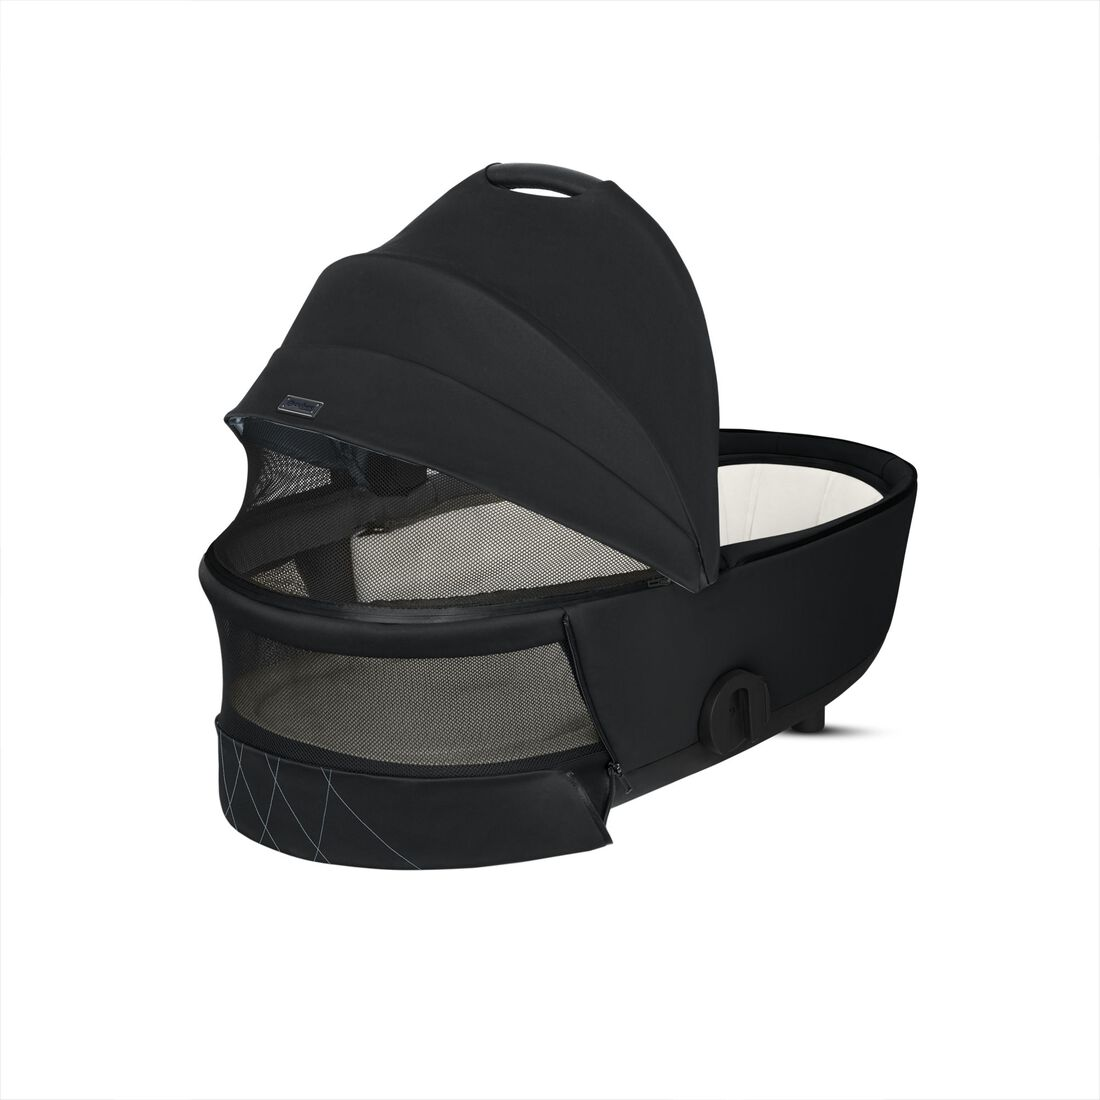 CYBEX Mios Lux Carry Cot - Deep Black in Deep Black large Bild 4